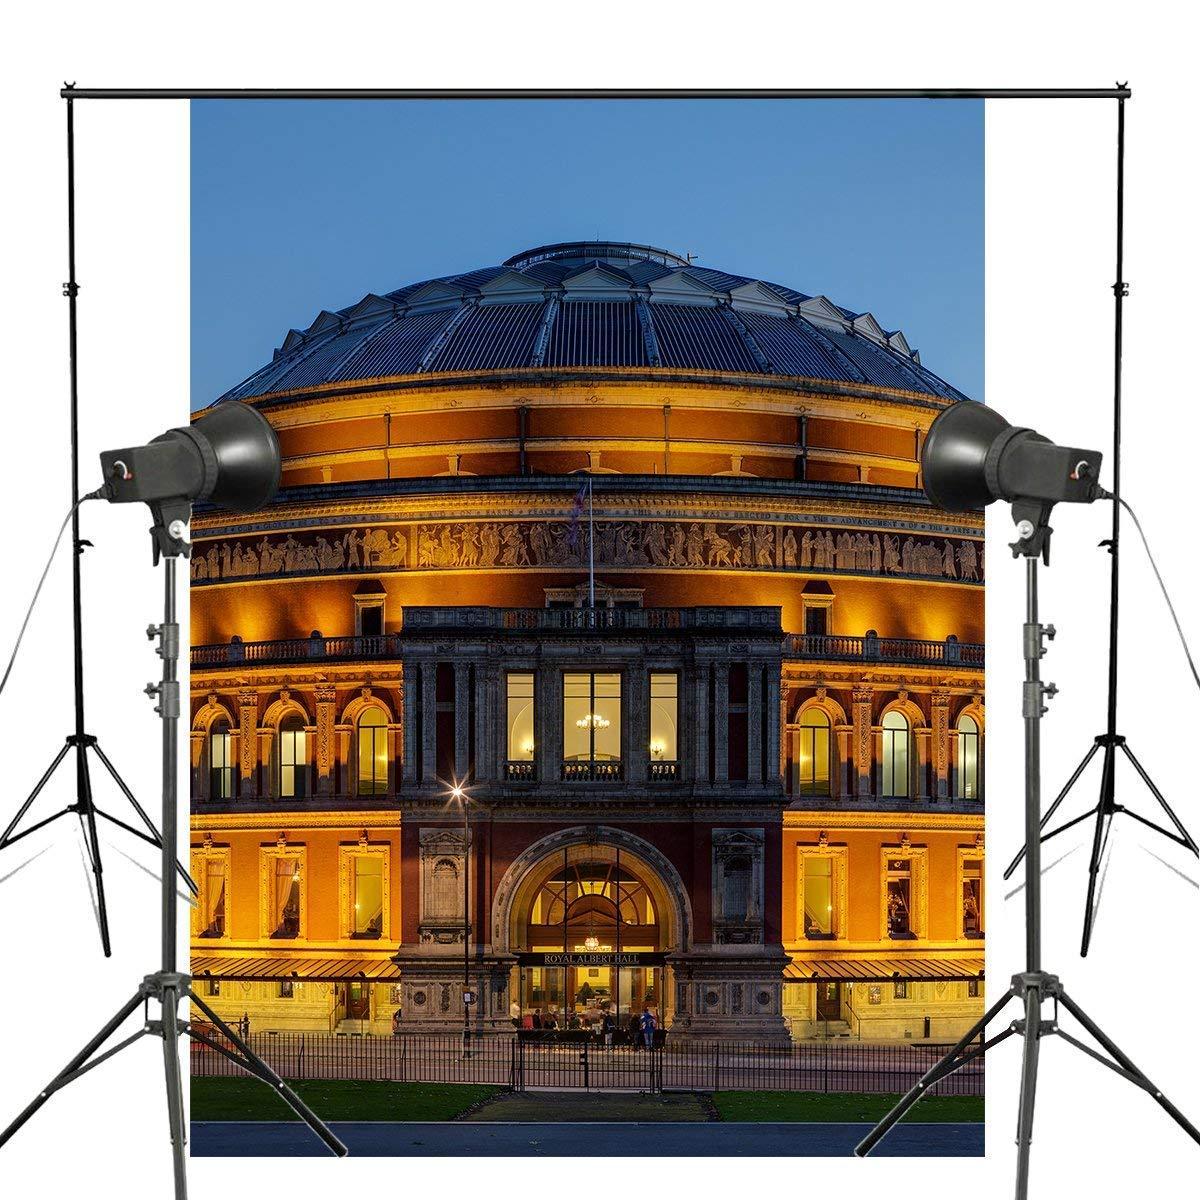 ERTIANANG 150x220cm Royal Albert Hall Photography Background London Architecture Backdrop Night Viem Theme Studio Background